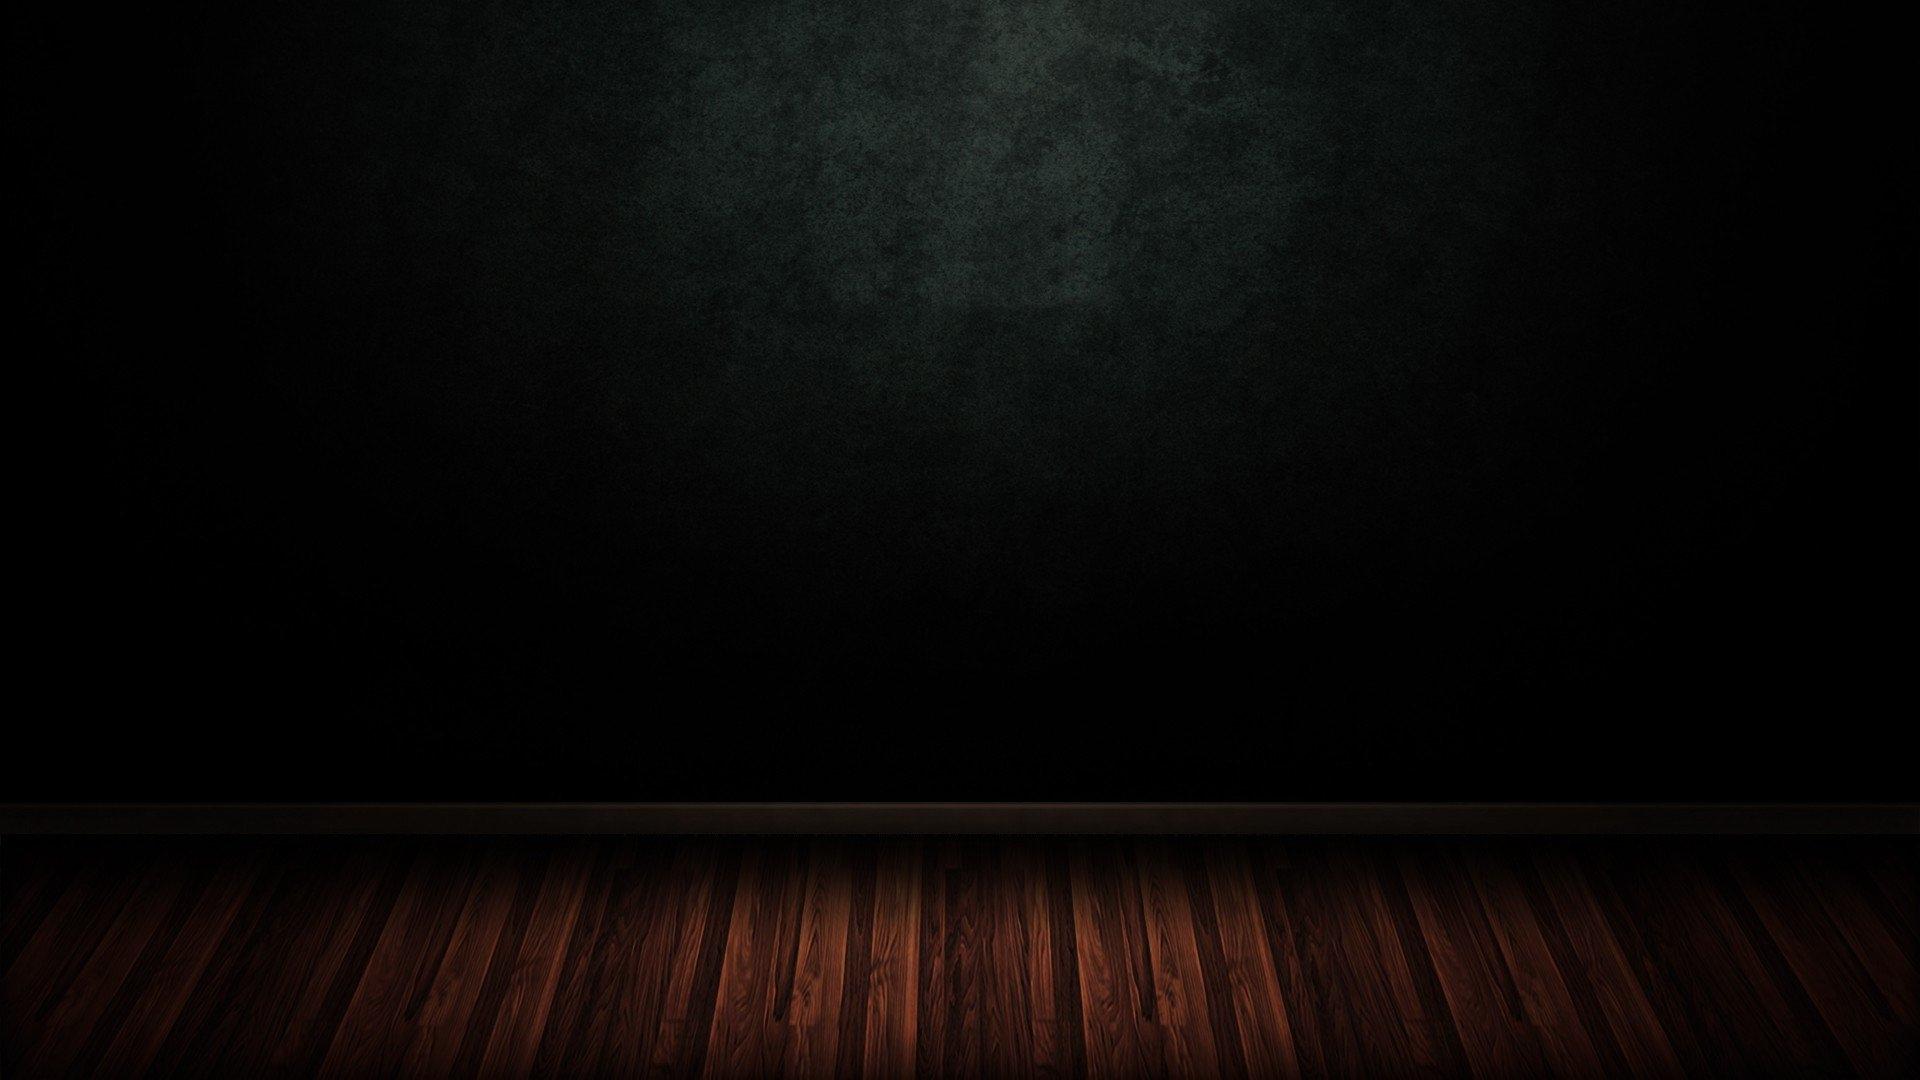 Free Download Dark Light Room Hd Wallpaper Background Images